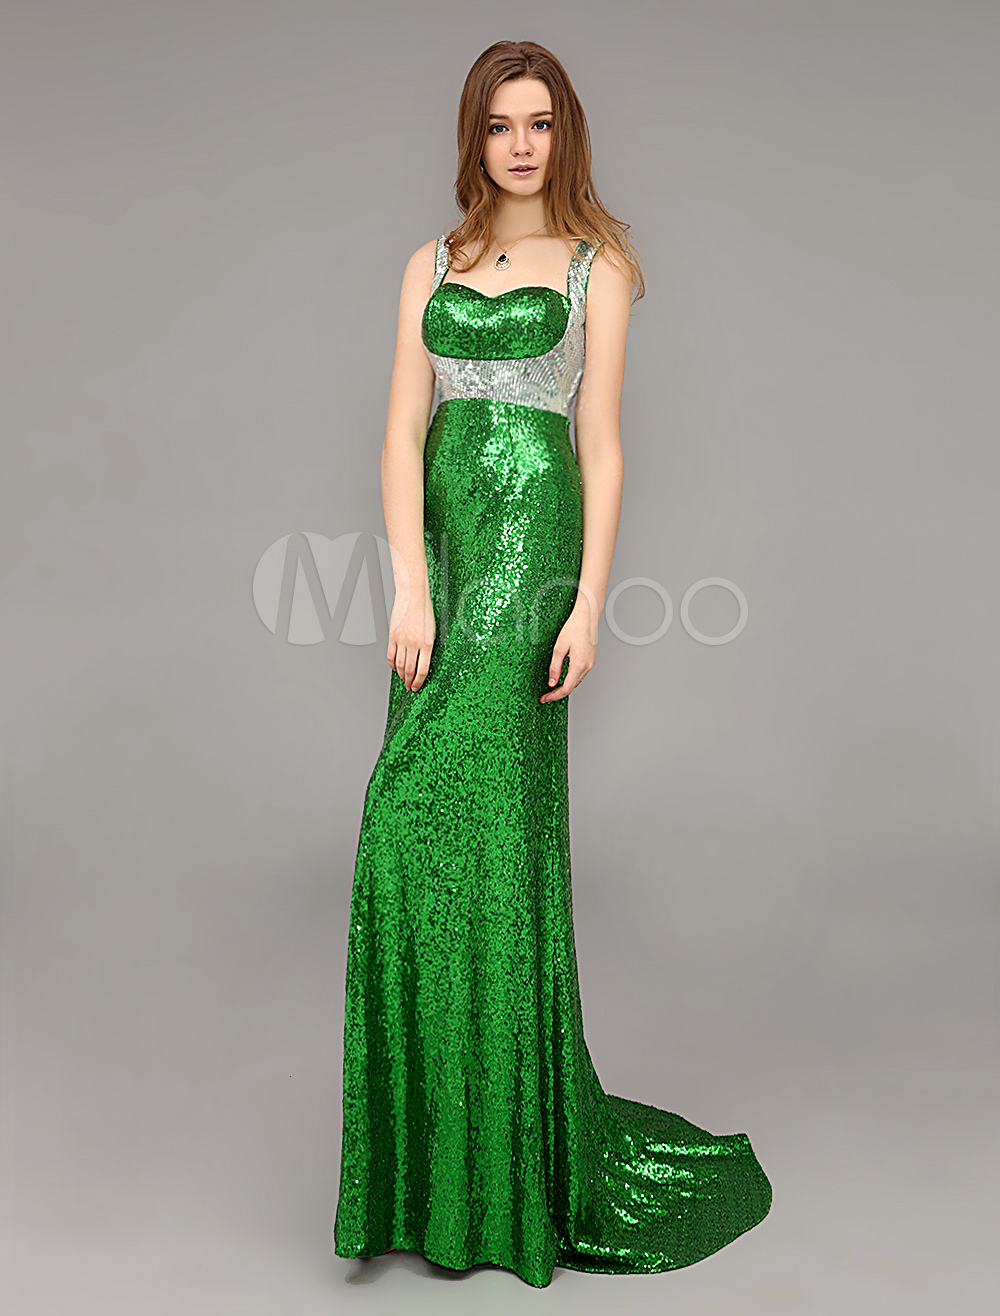 Green Long Signed Open Back Designer Evening Dress With Train Milanoo (Wedding Evening Dresses) photo